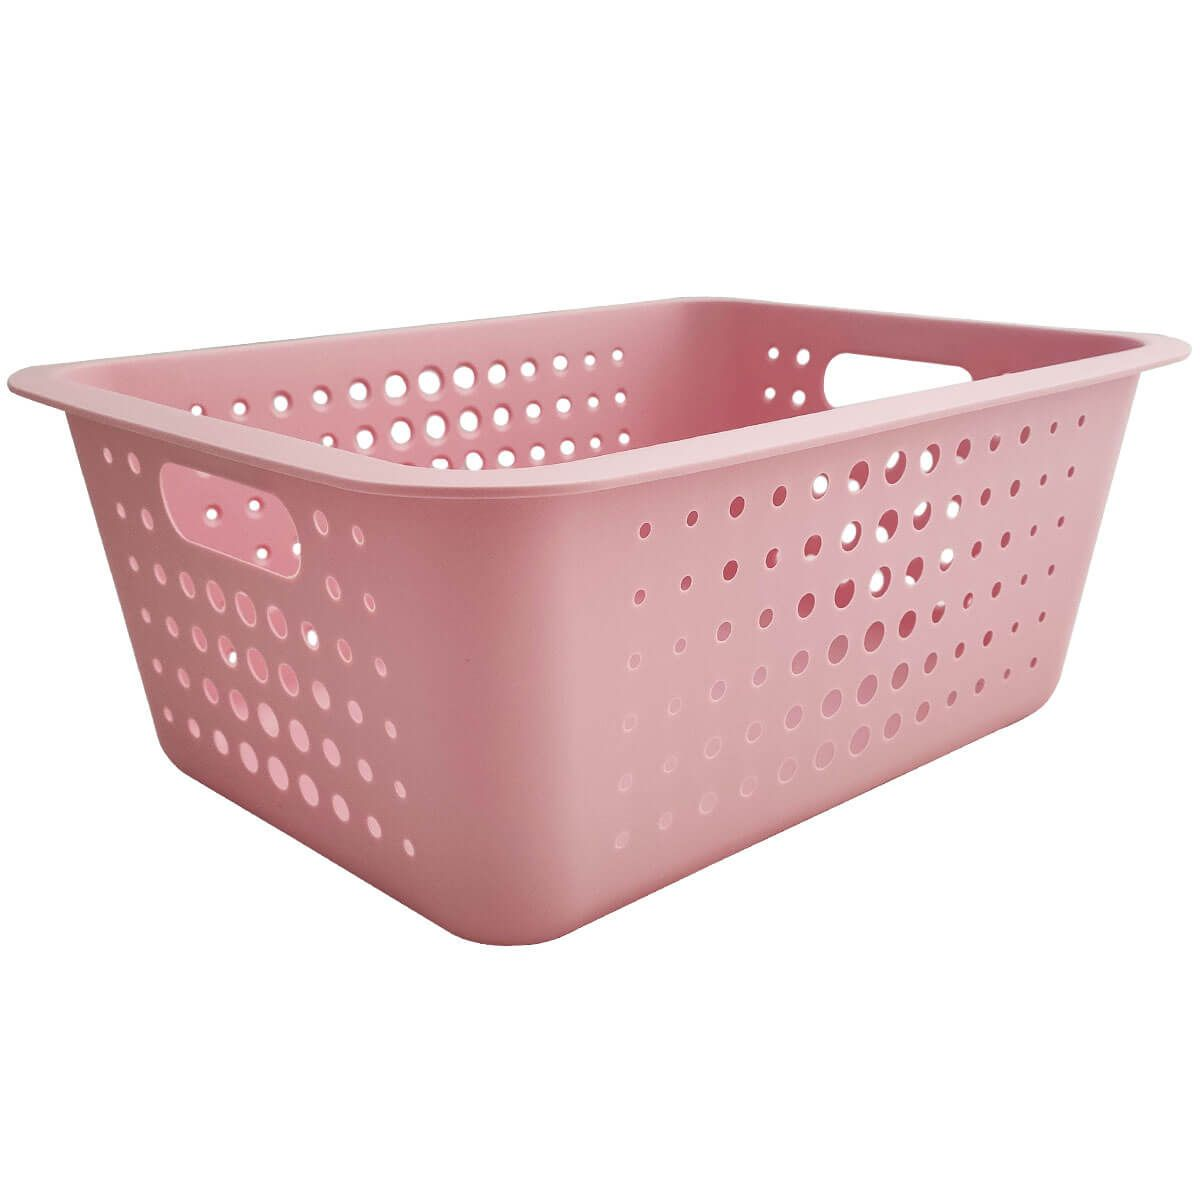 Caixa Organizadora Grande Organize Cesto Plástico 14,5 Litros Rosa Quartzo